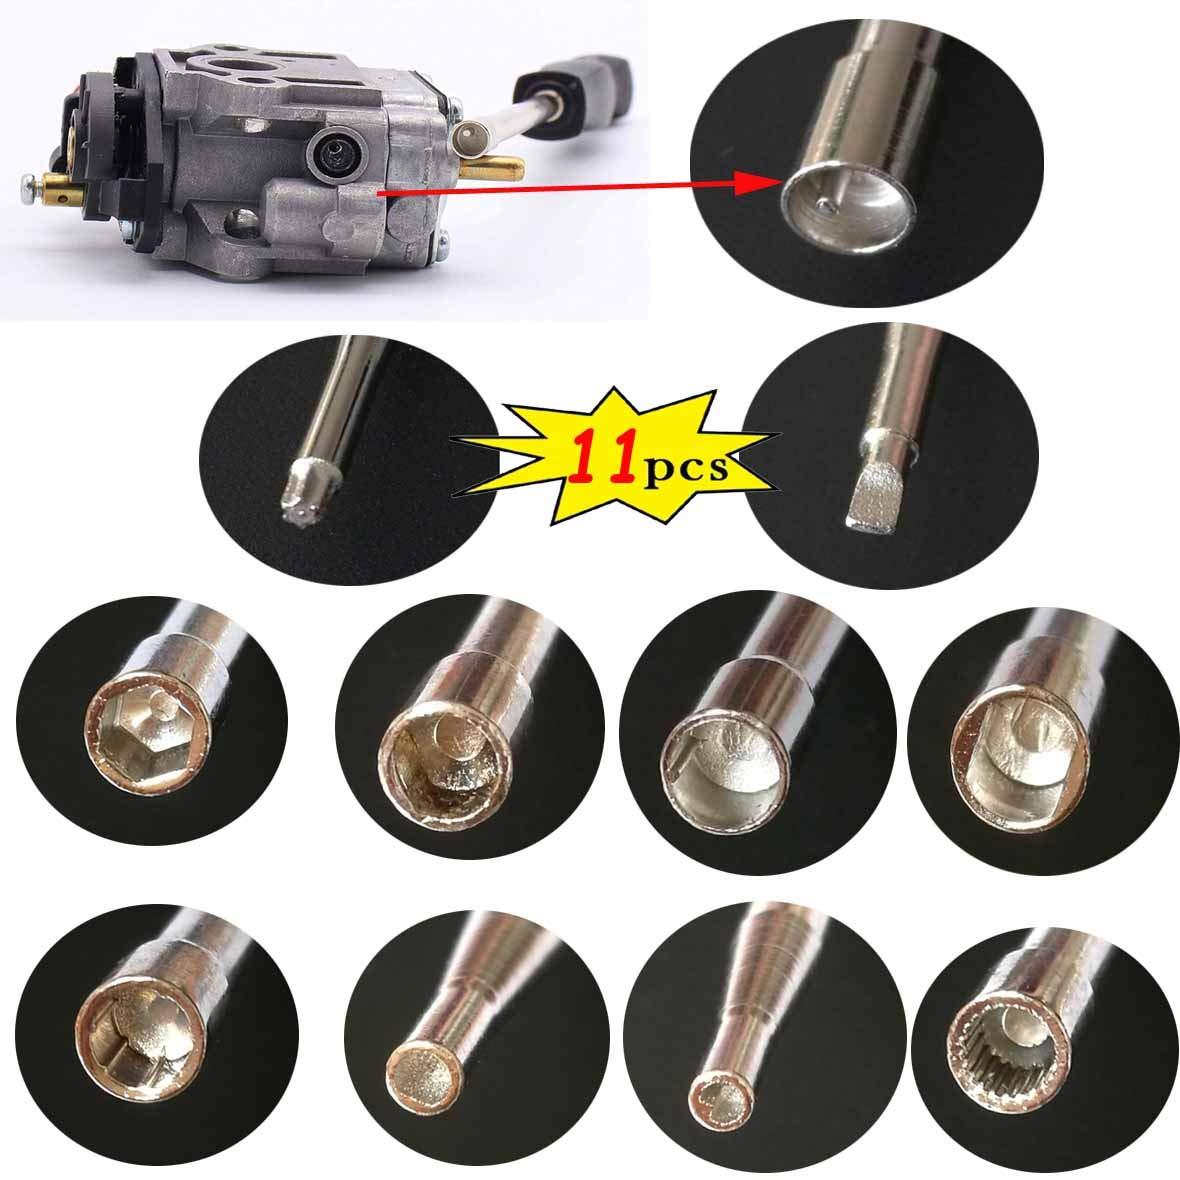 Includes: Carrying Case + Cleaning Brush Carburetor Adjustment Tool Set Carburetor Tune up Adjusting Tool Carburetor Adjustment Tool for Common 2 Cycle Carburator Engine 11pcs